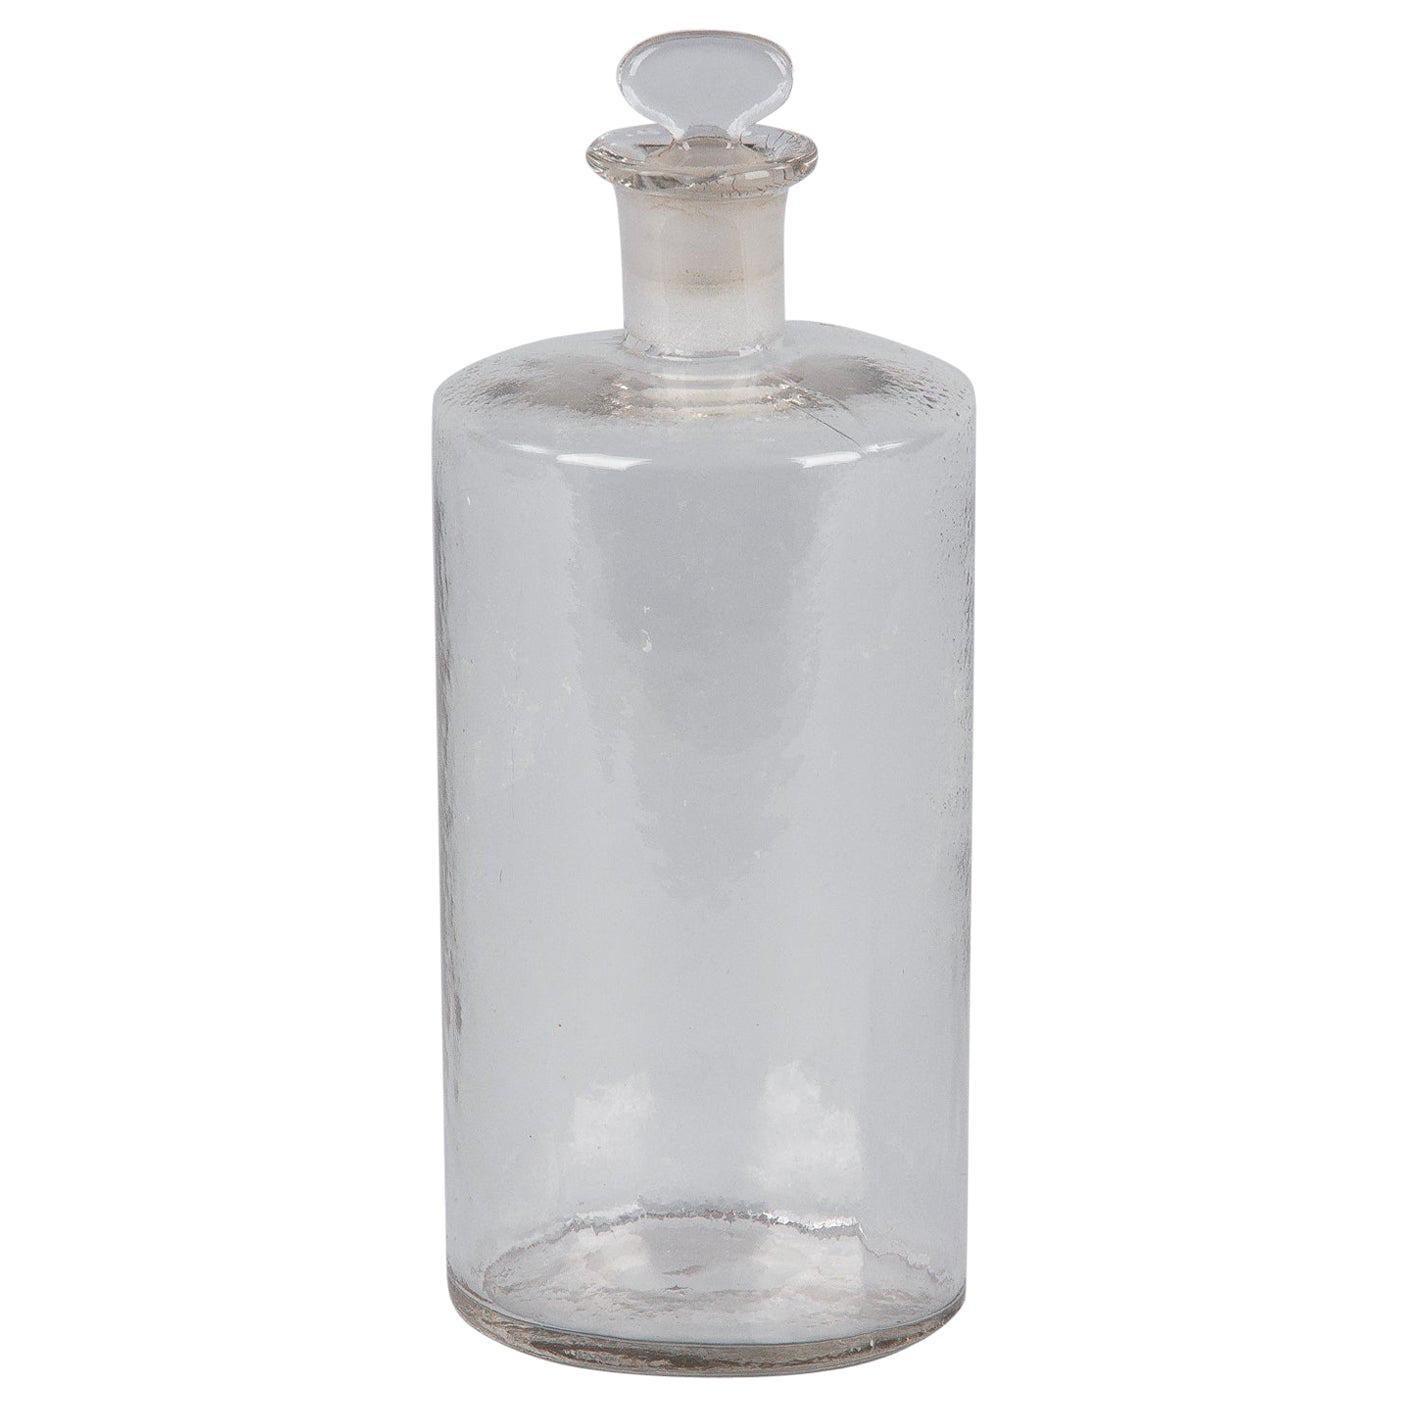 French Glass Pharmacy Jar, Early 1900s